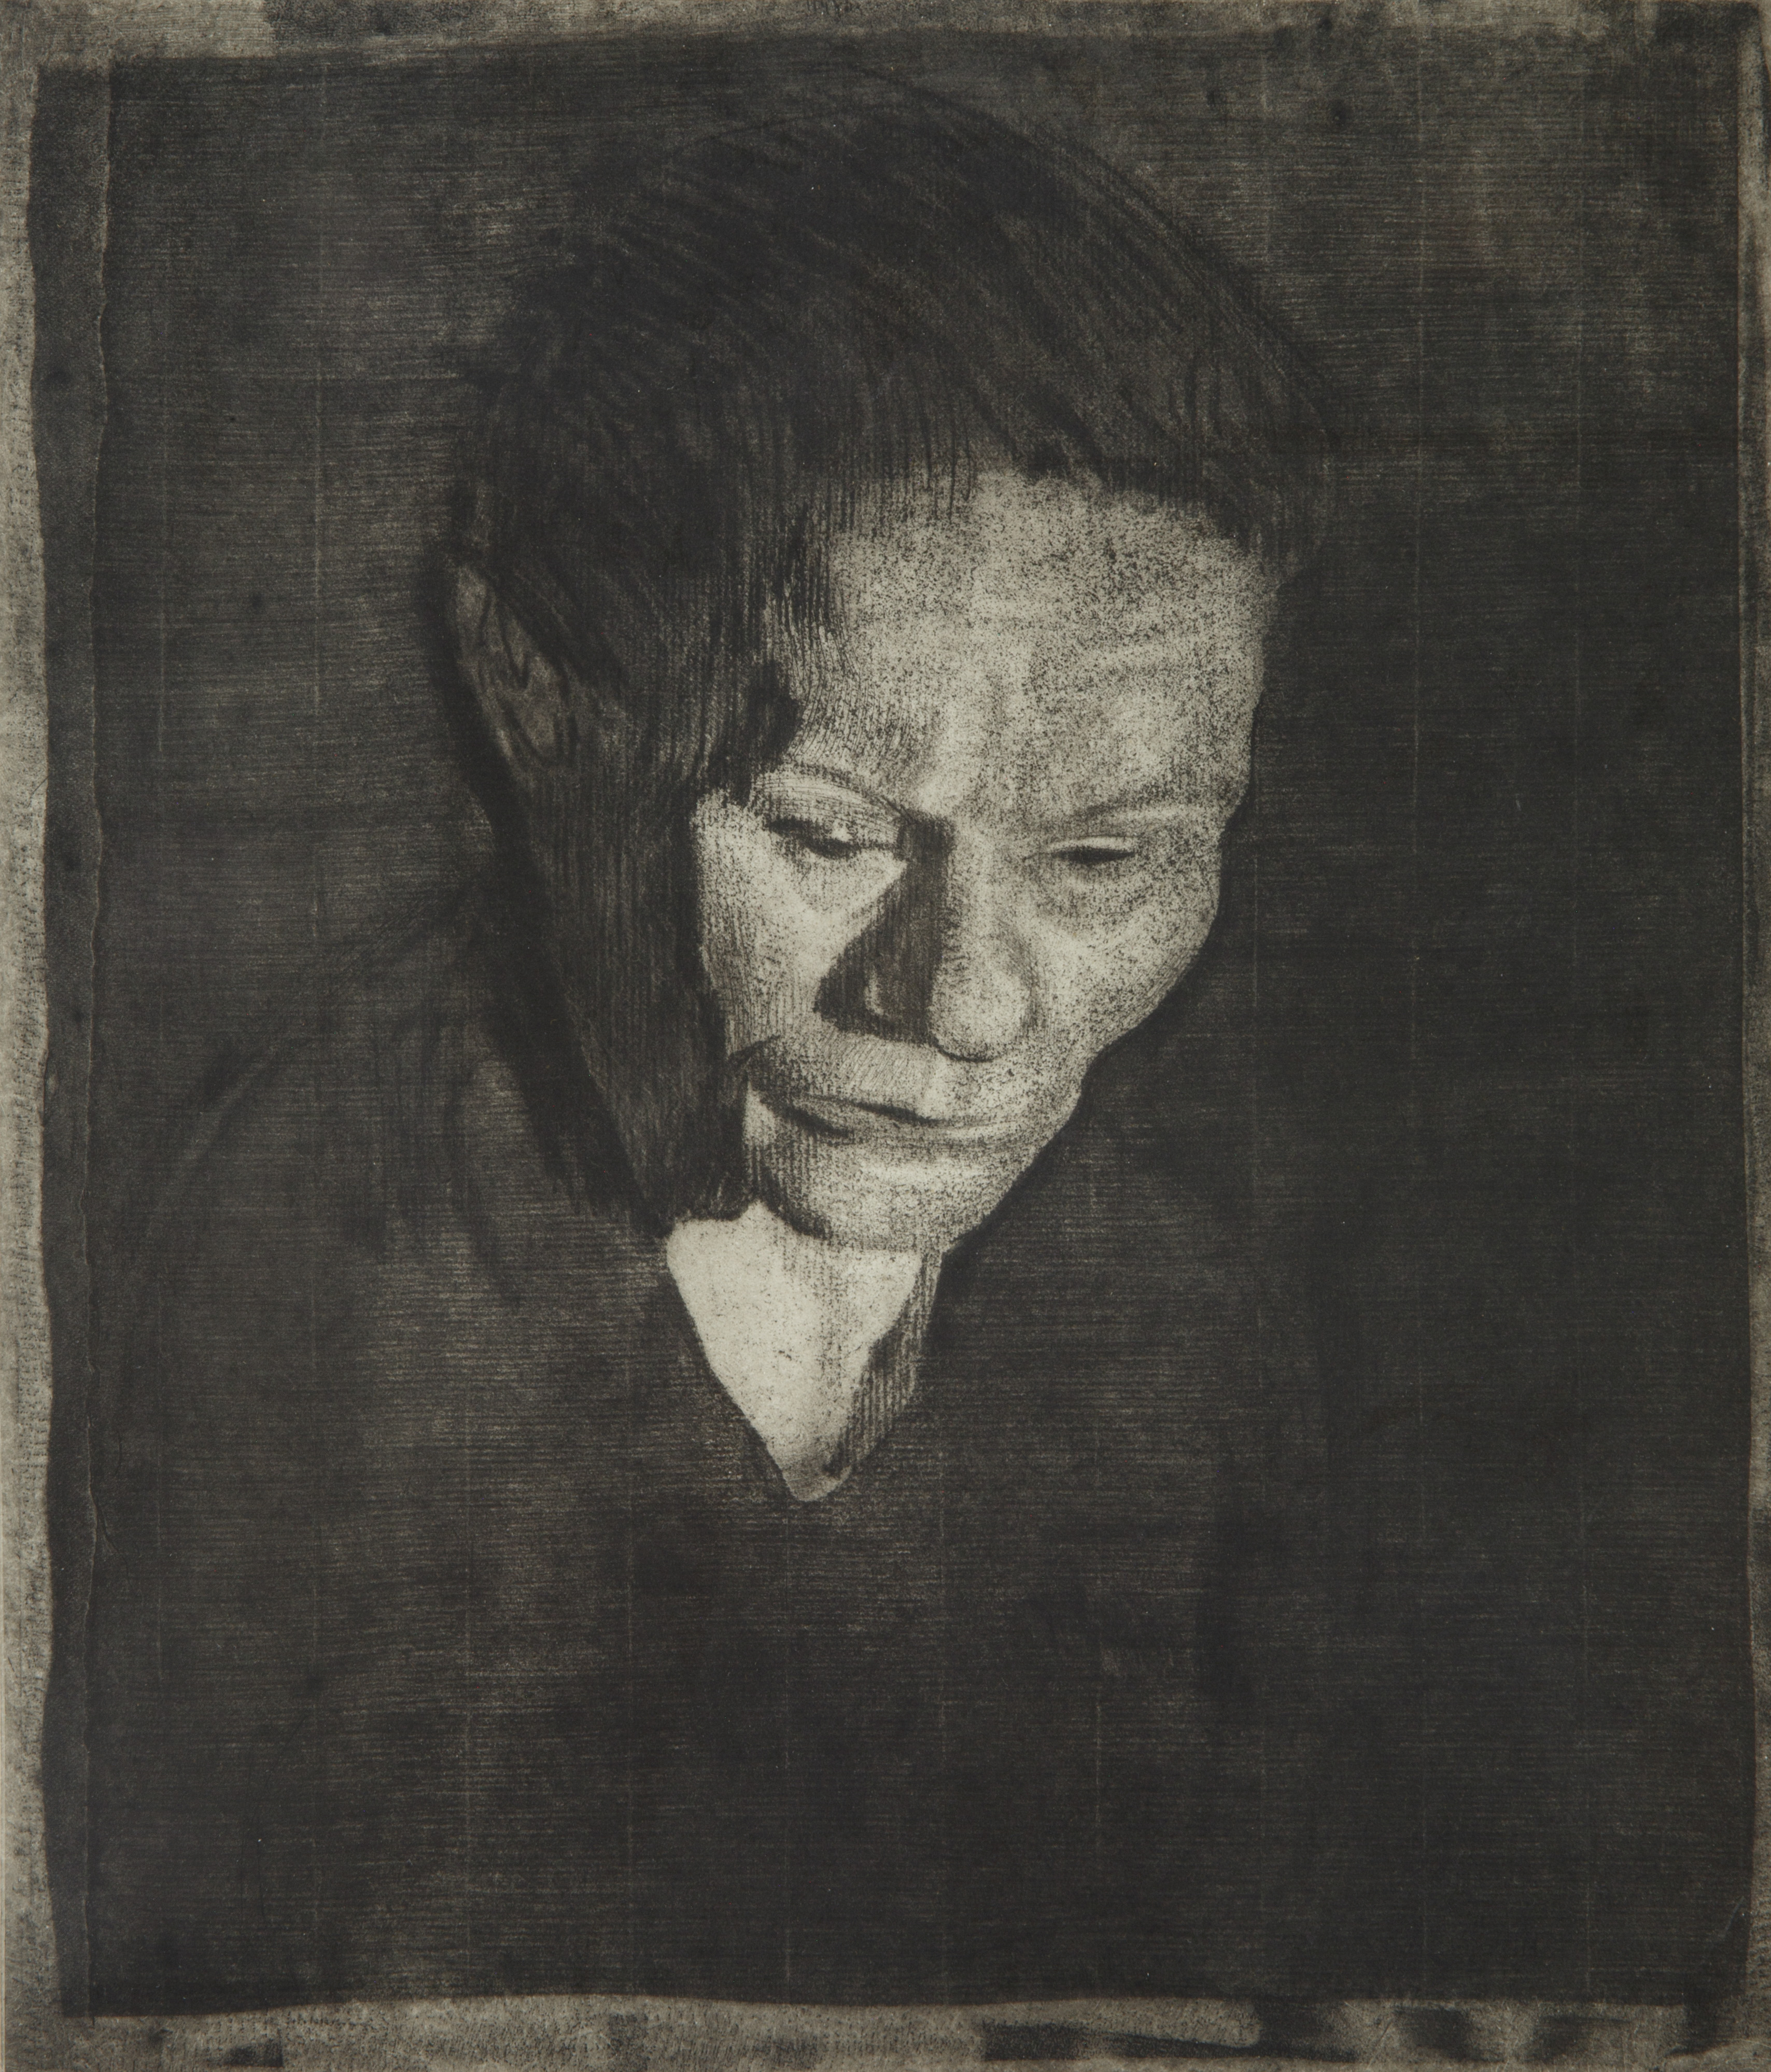 KATHE KOLLWITZ (GERMAN 1867-1945)